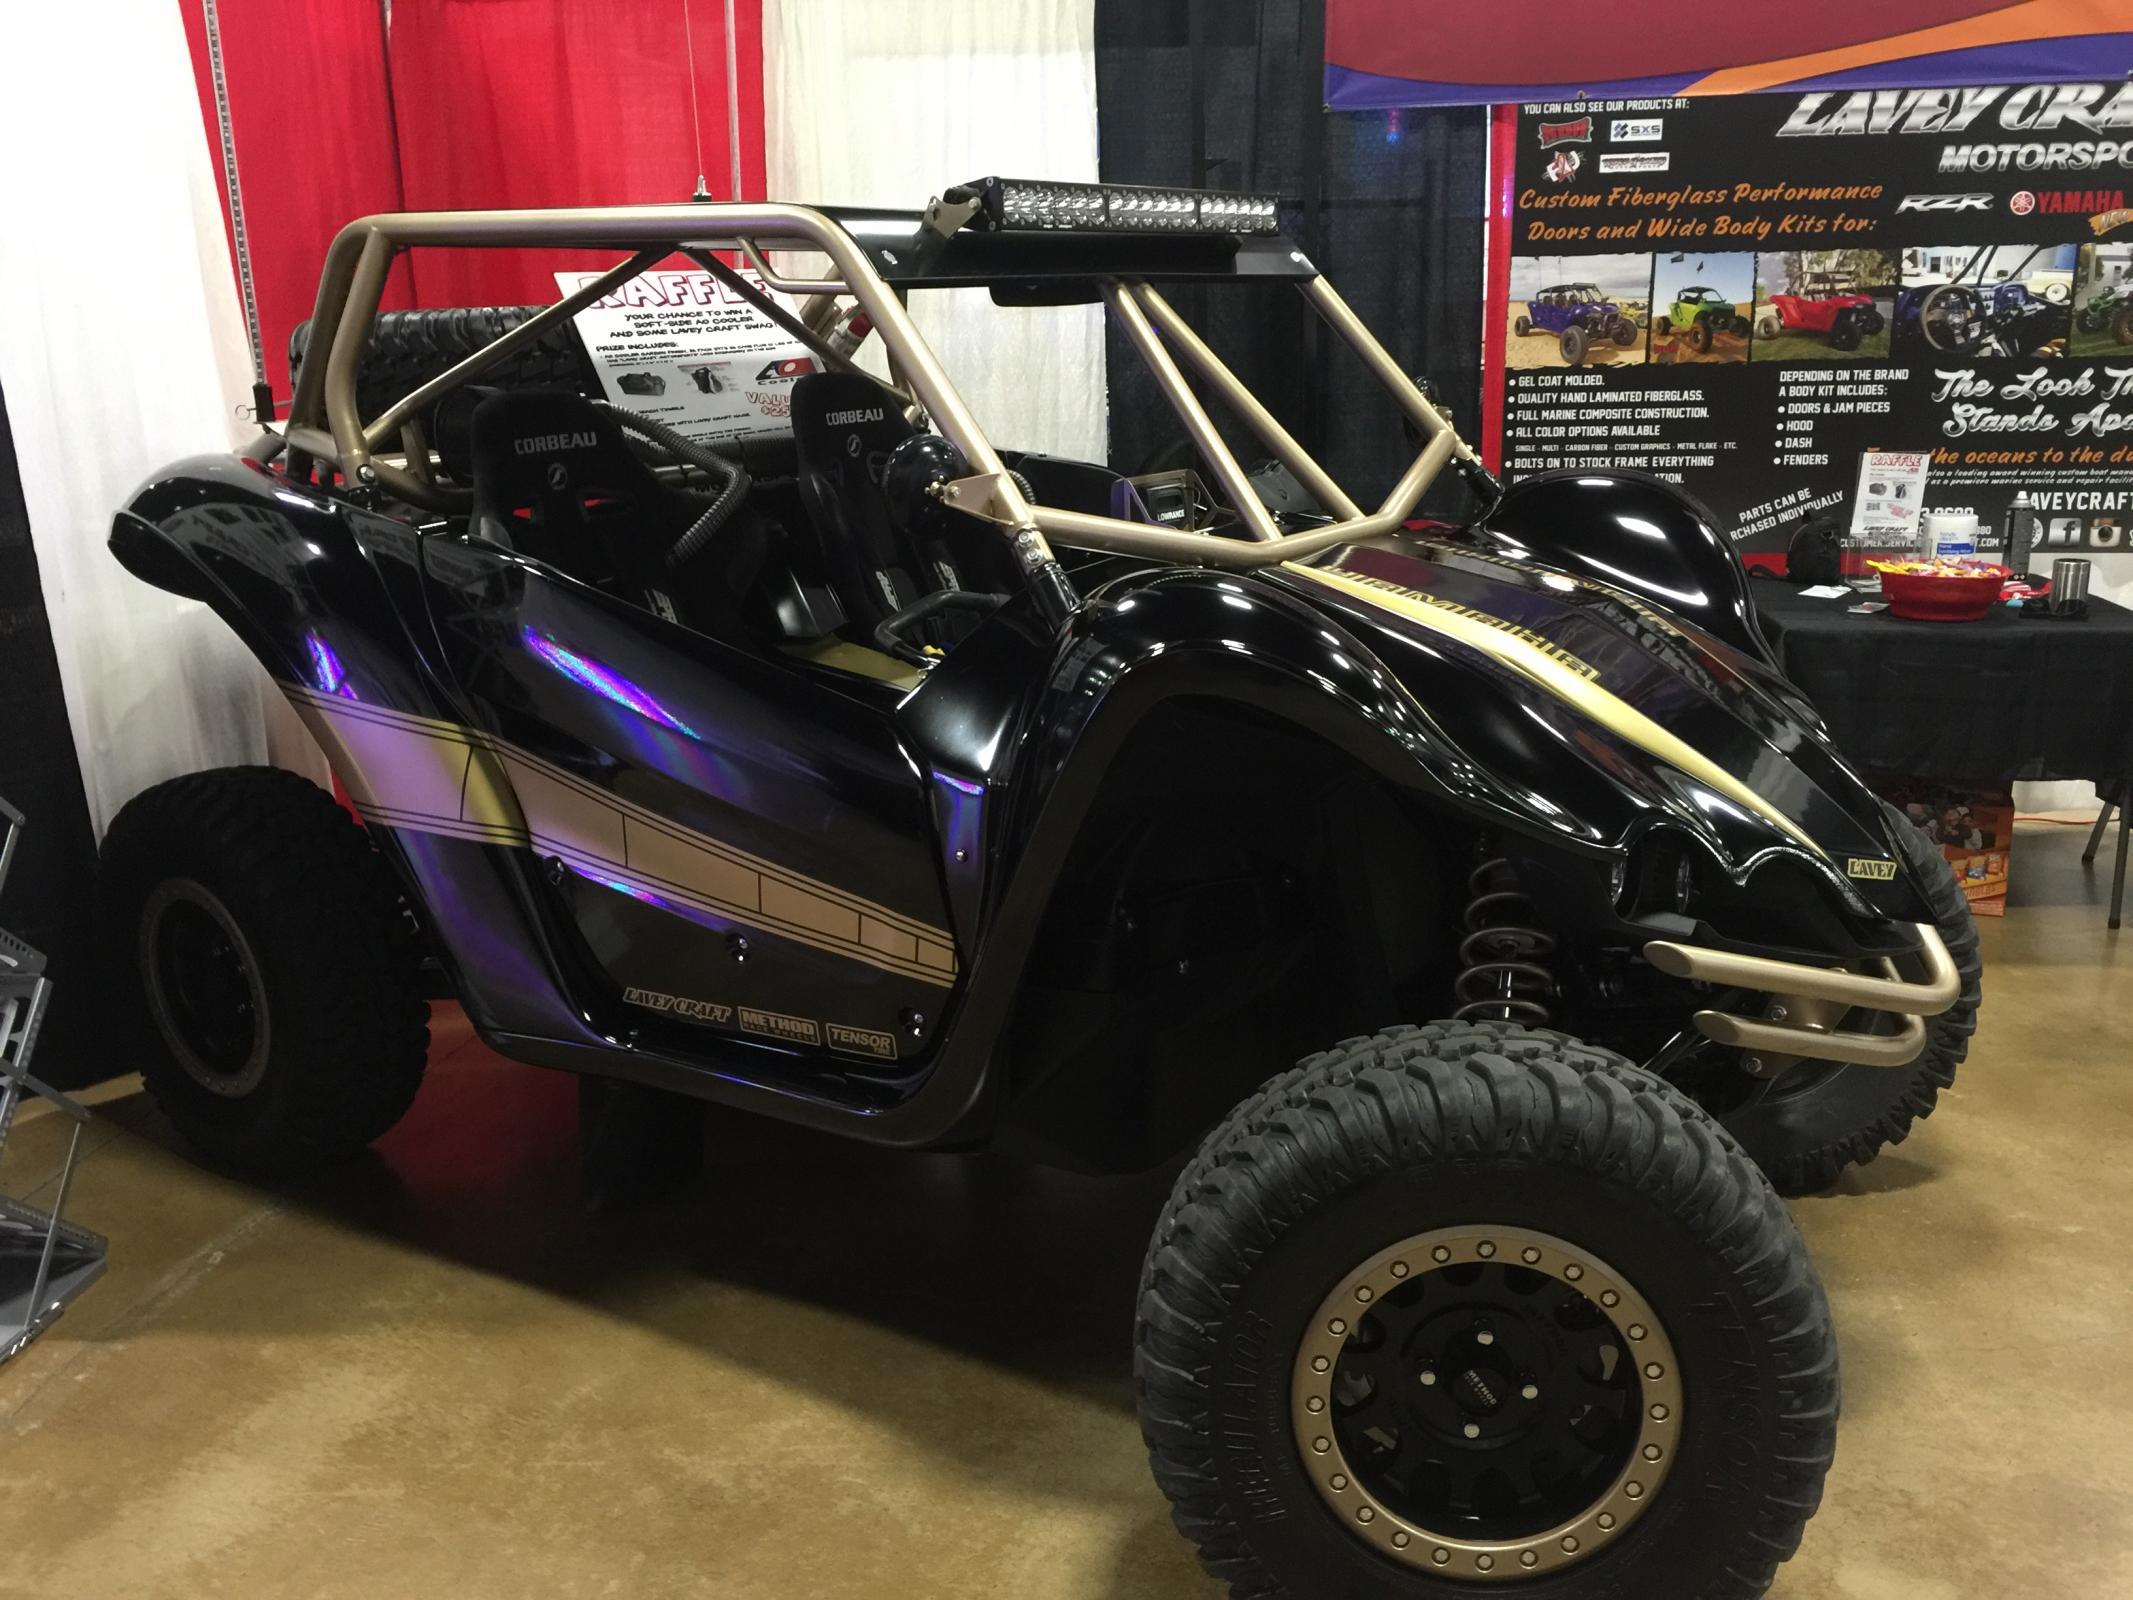 Lavey Craft Motorsports Launches Fiberglass Body Kit for